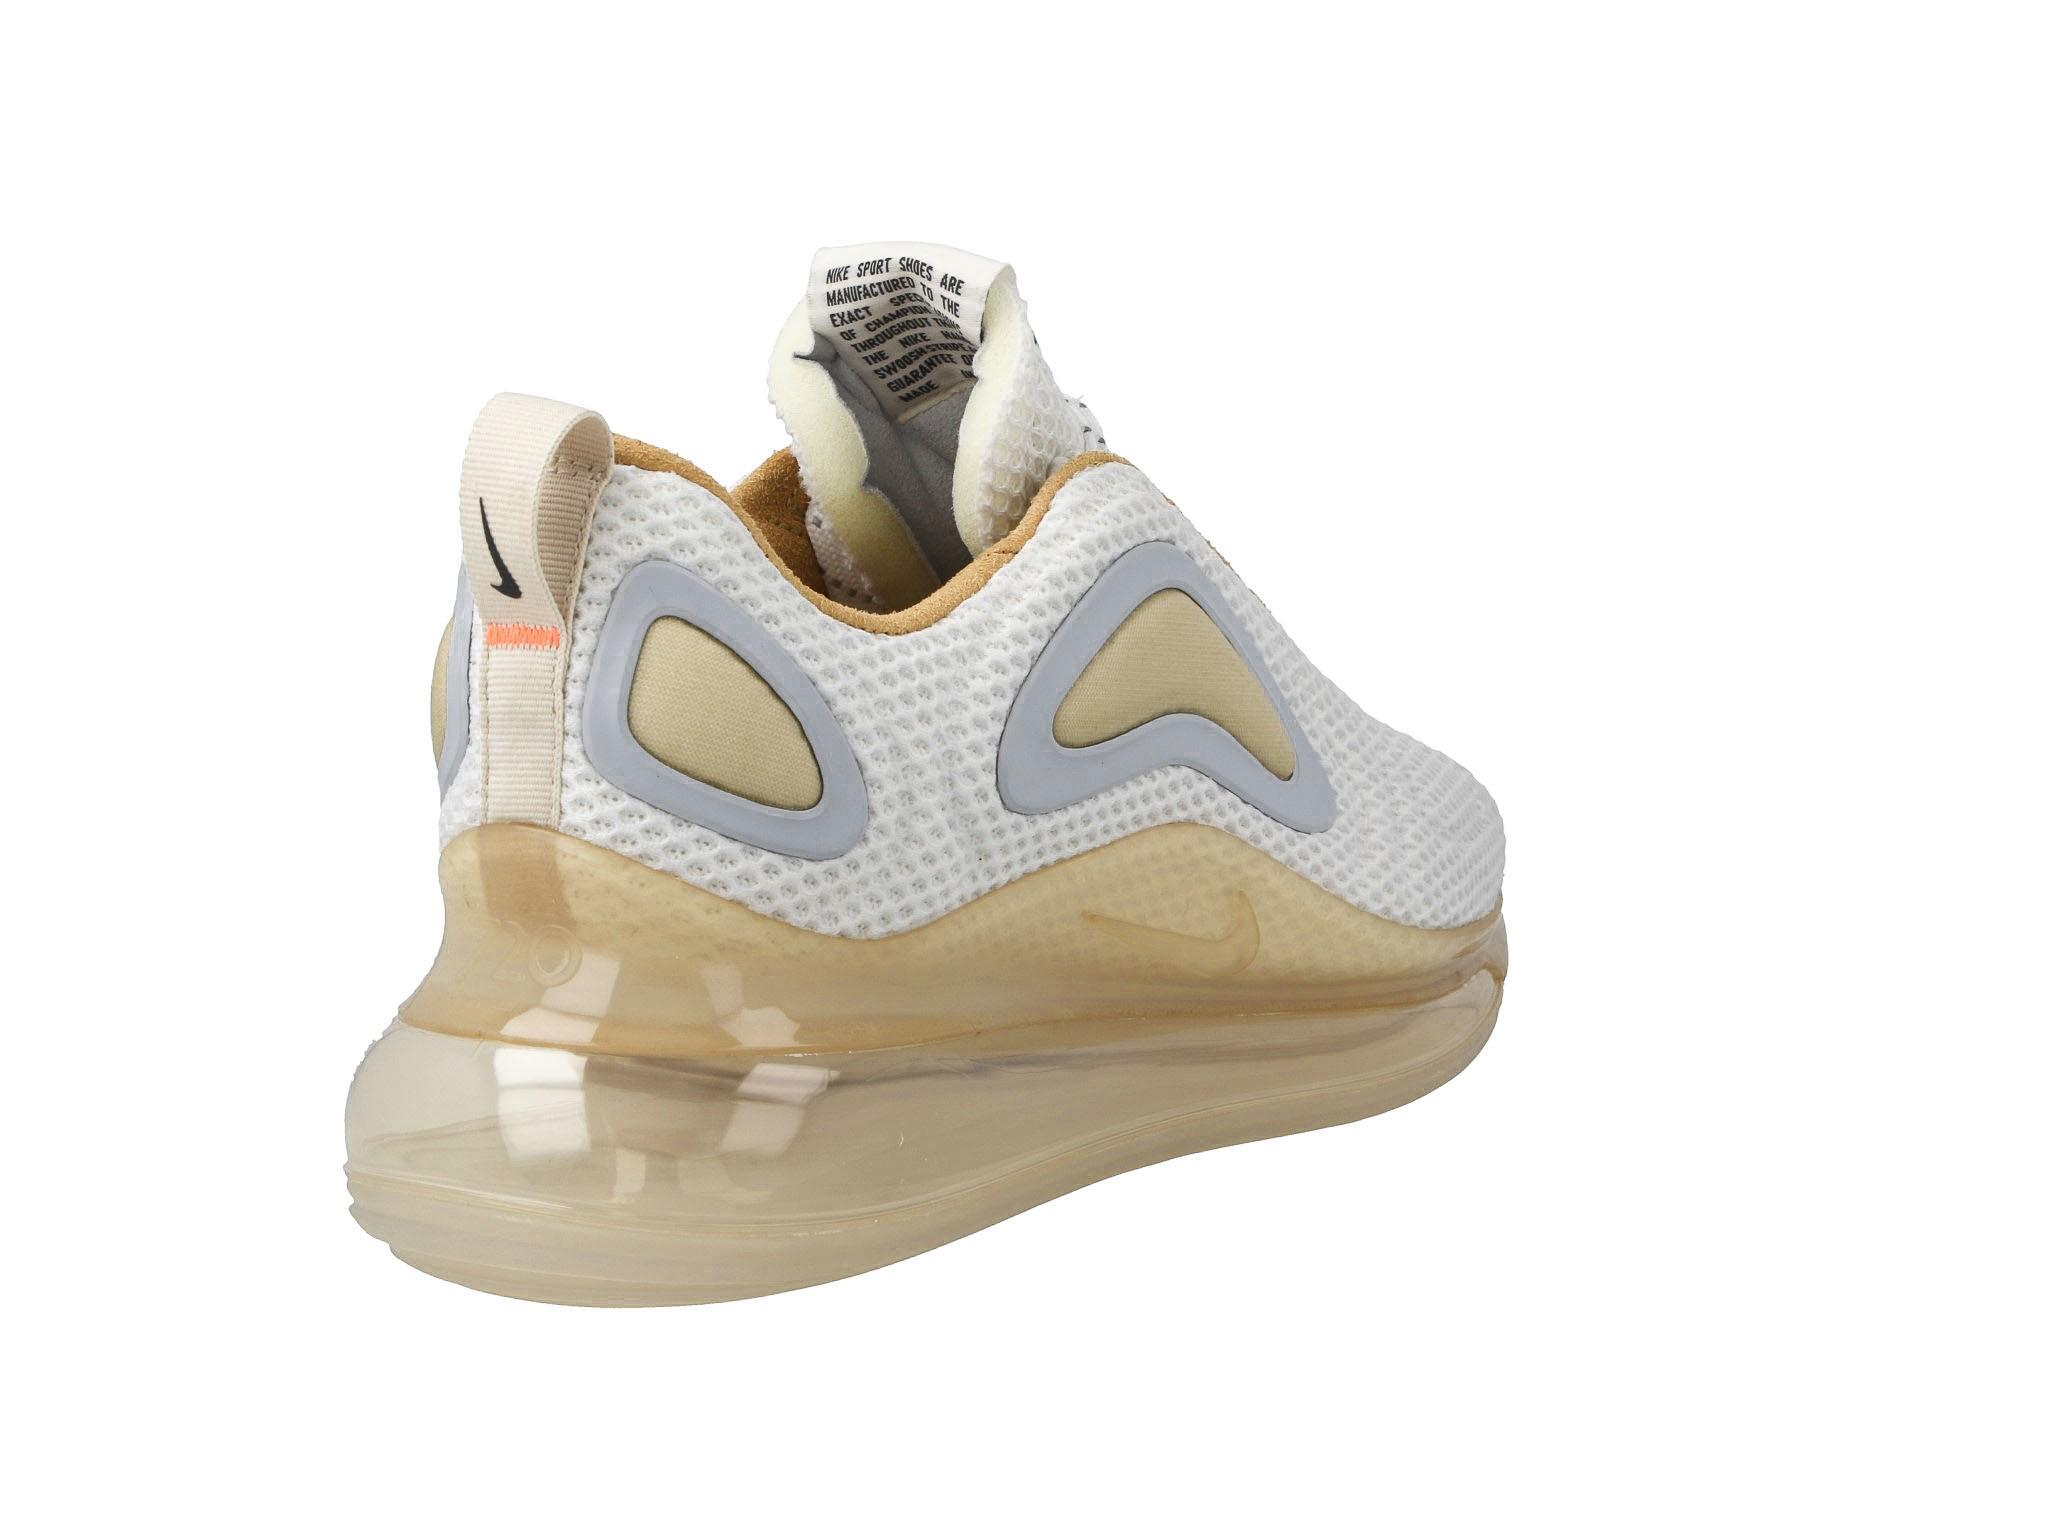 Nike Air Max 720 WhiteAnthracite Pale Vanilla CI6393 100